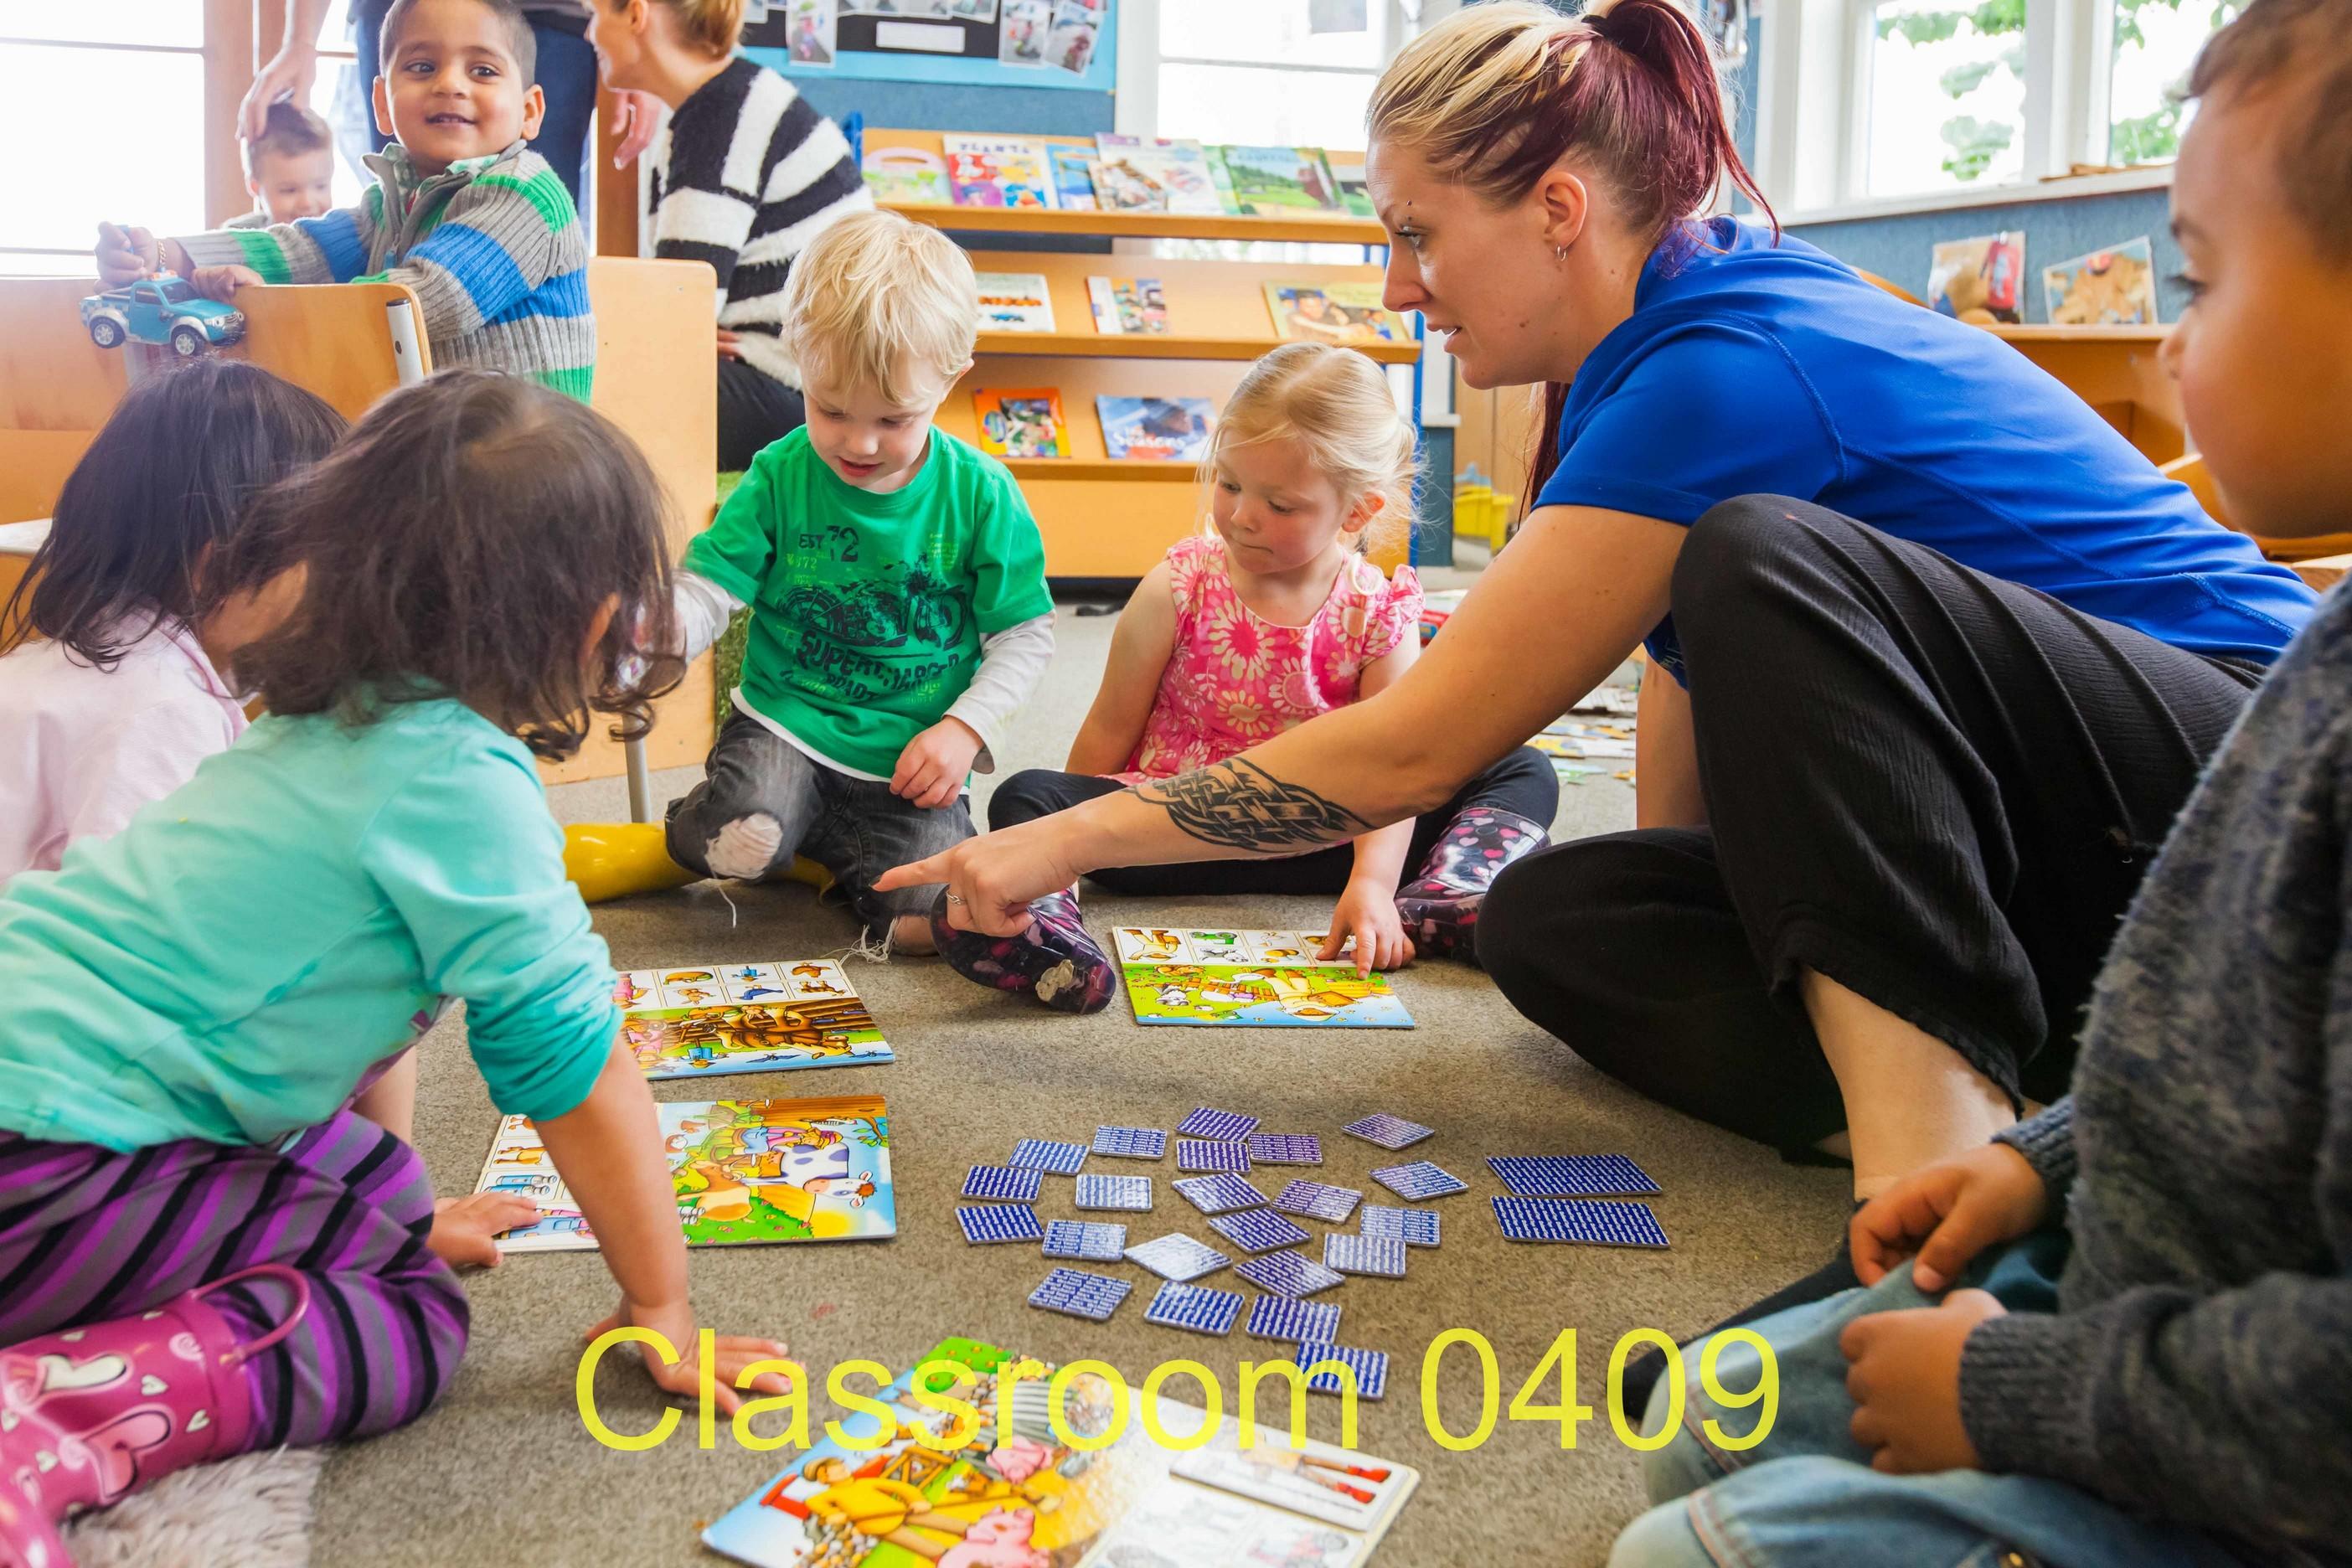 Classroom 0409